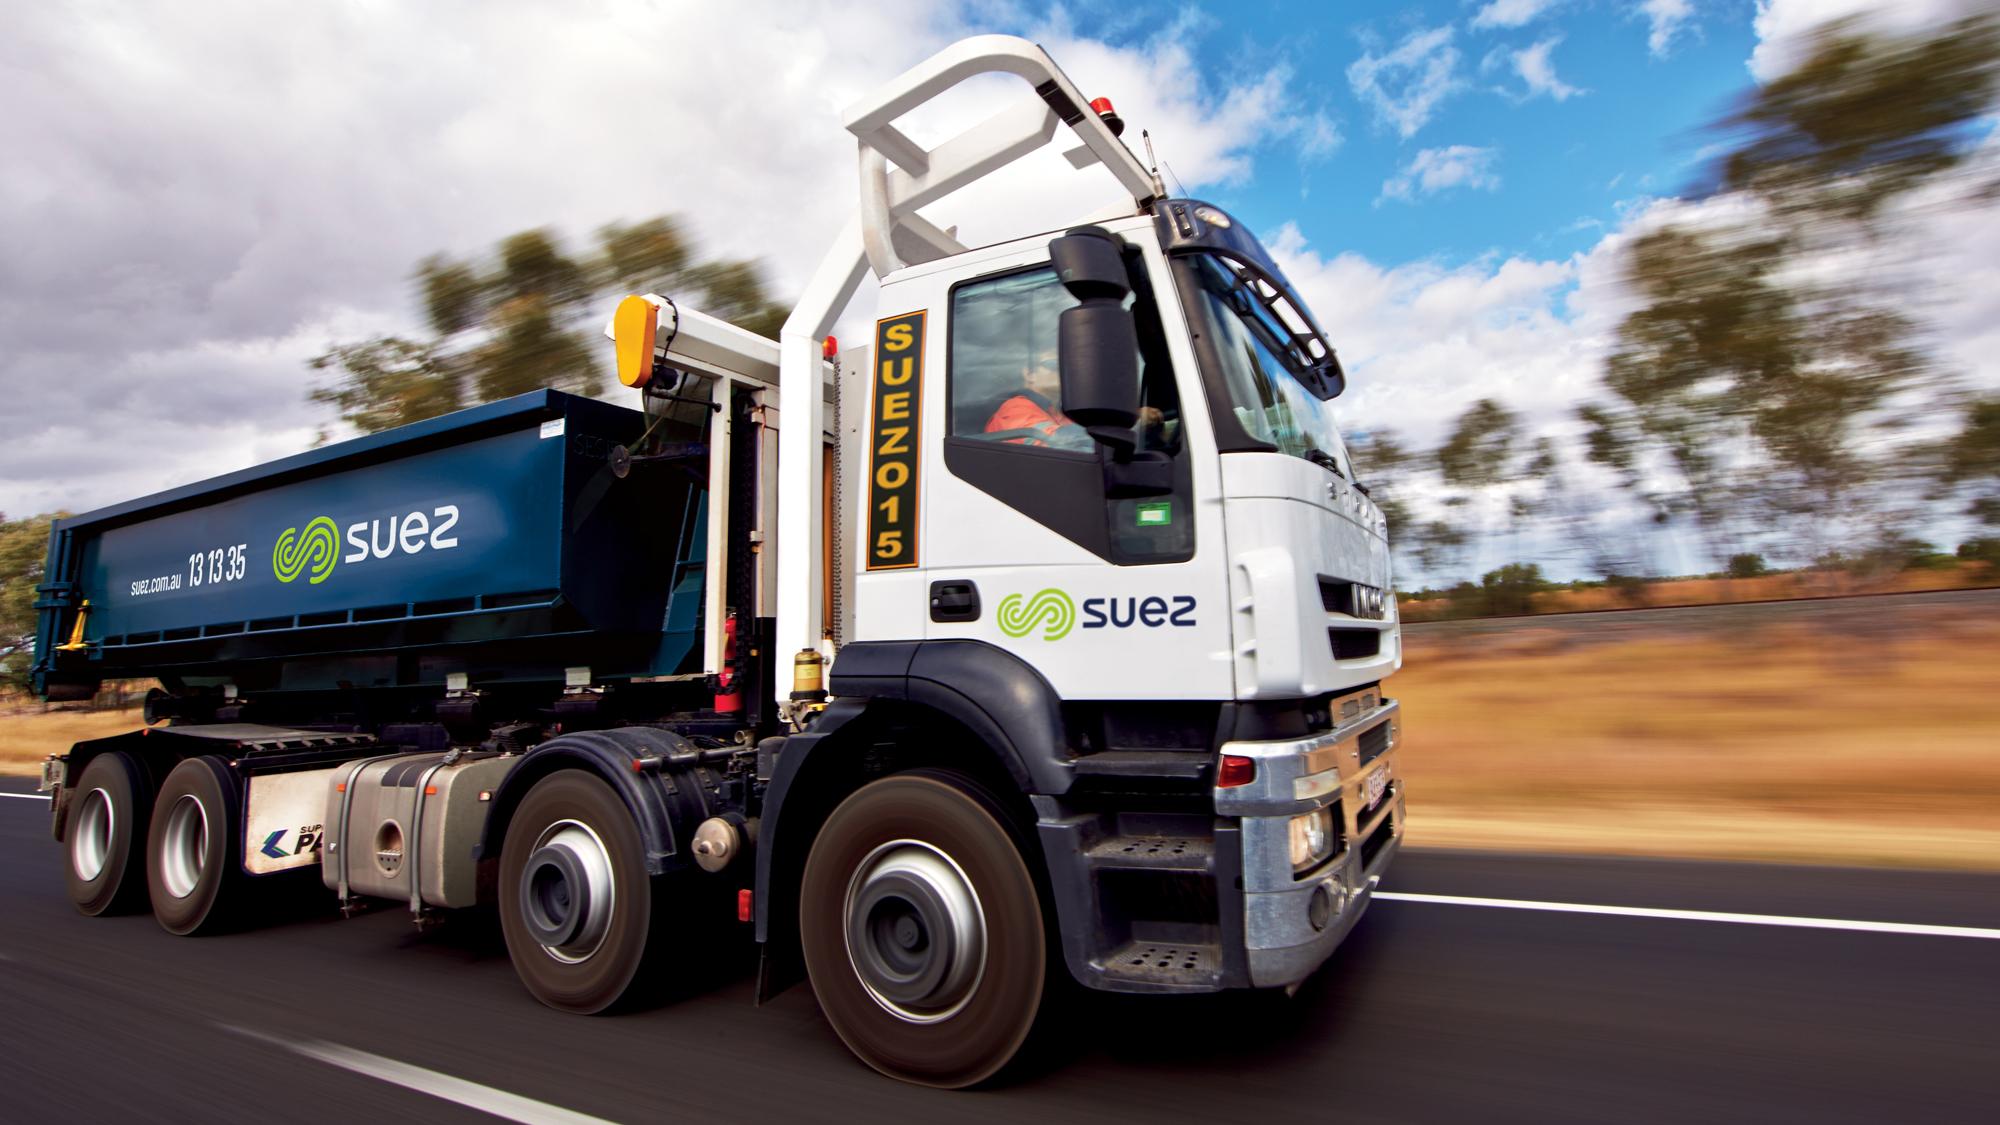 SUEZ skip bins header image. Image of SUEZ RORO truck unloading a RORO bin at an industrial area.